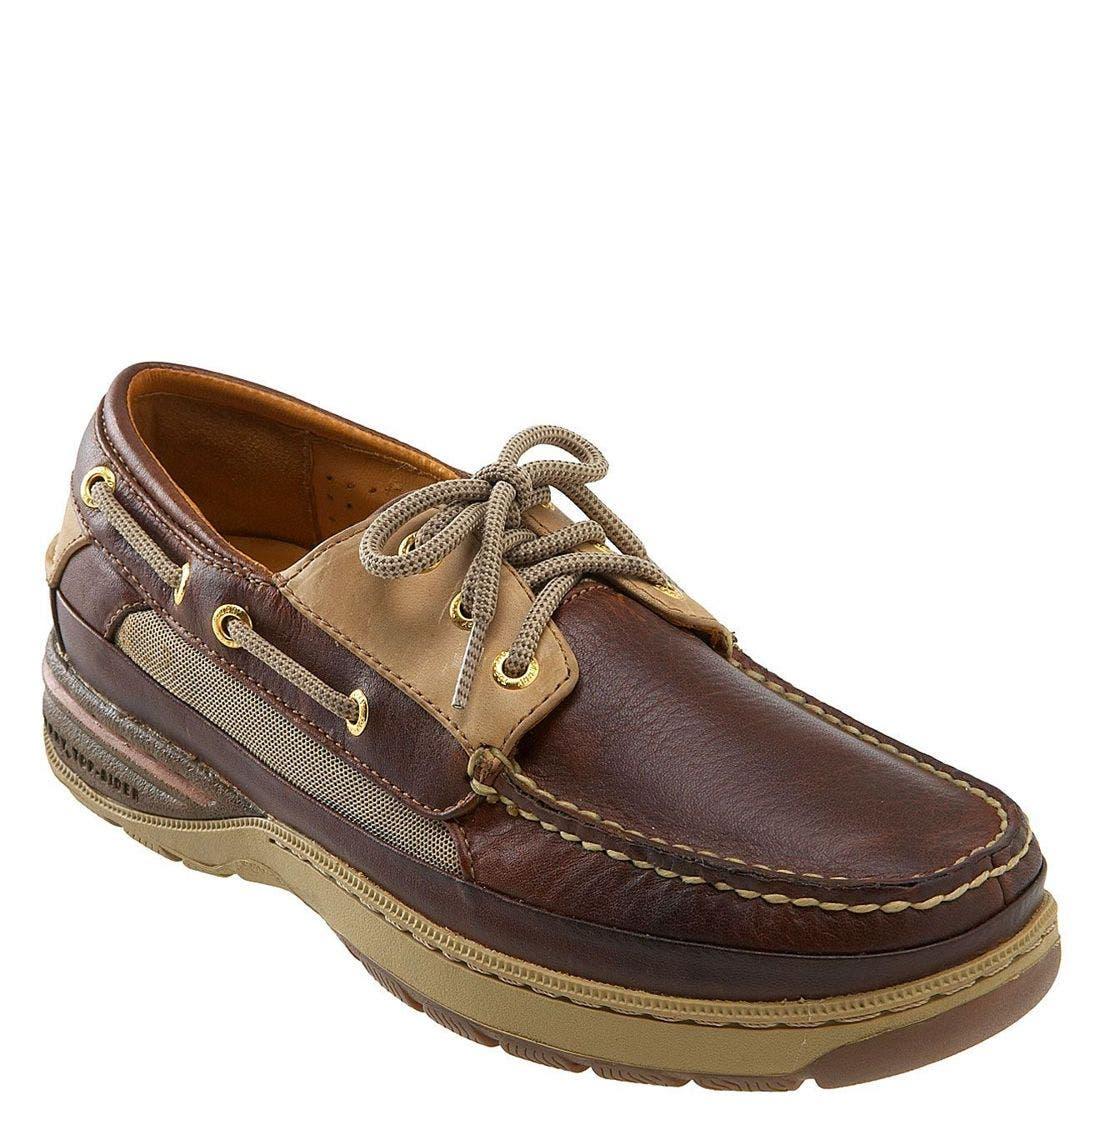 Alternate Image 1 Selected - Sperry 'Gold Billfish 3-Eye' Boat Shoe